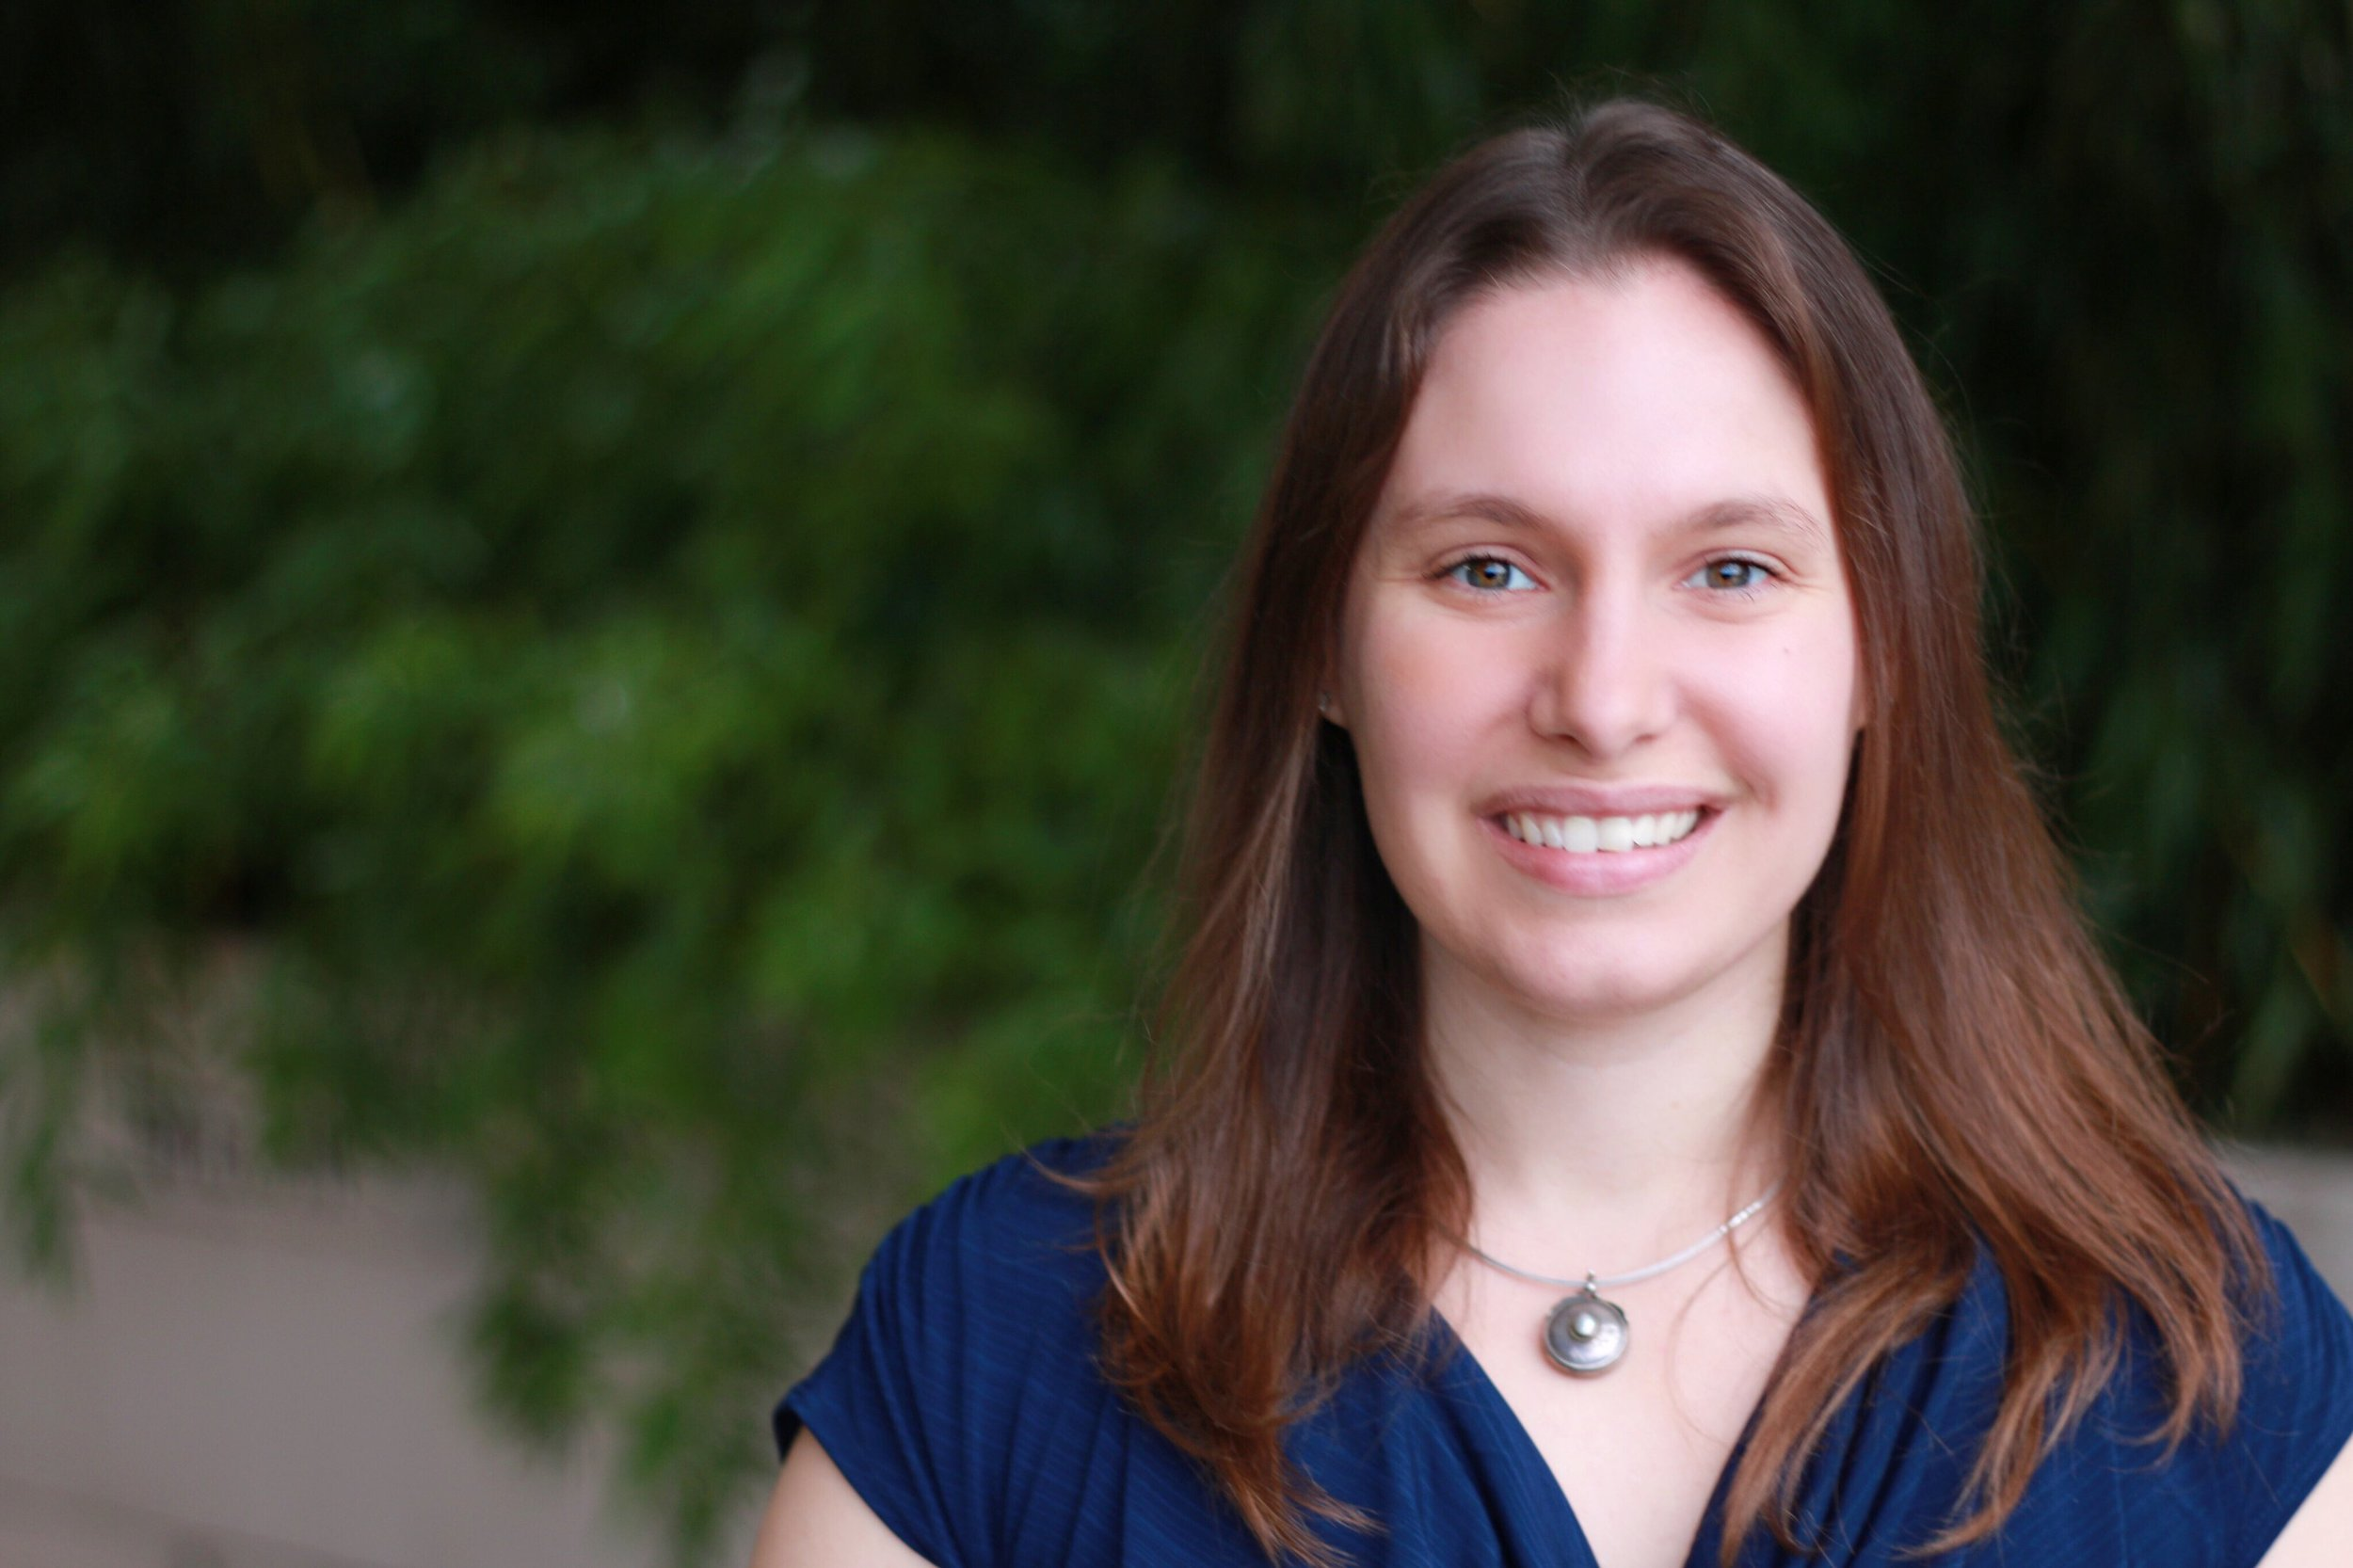 Justine Cosman